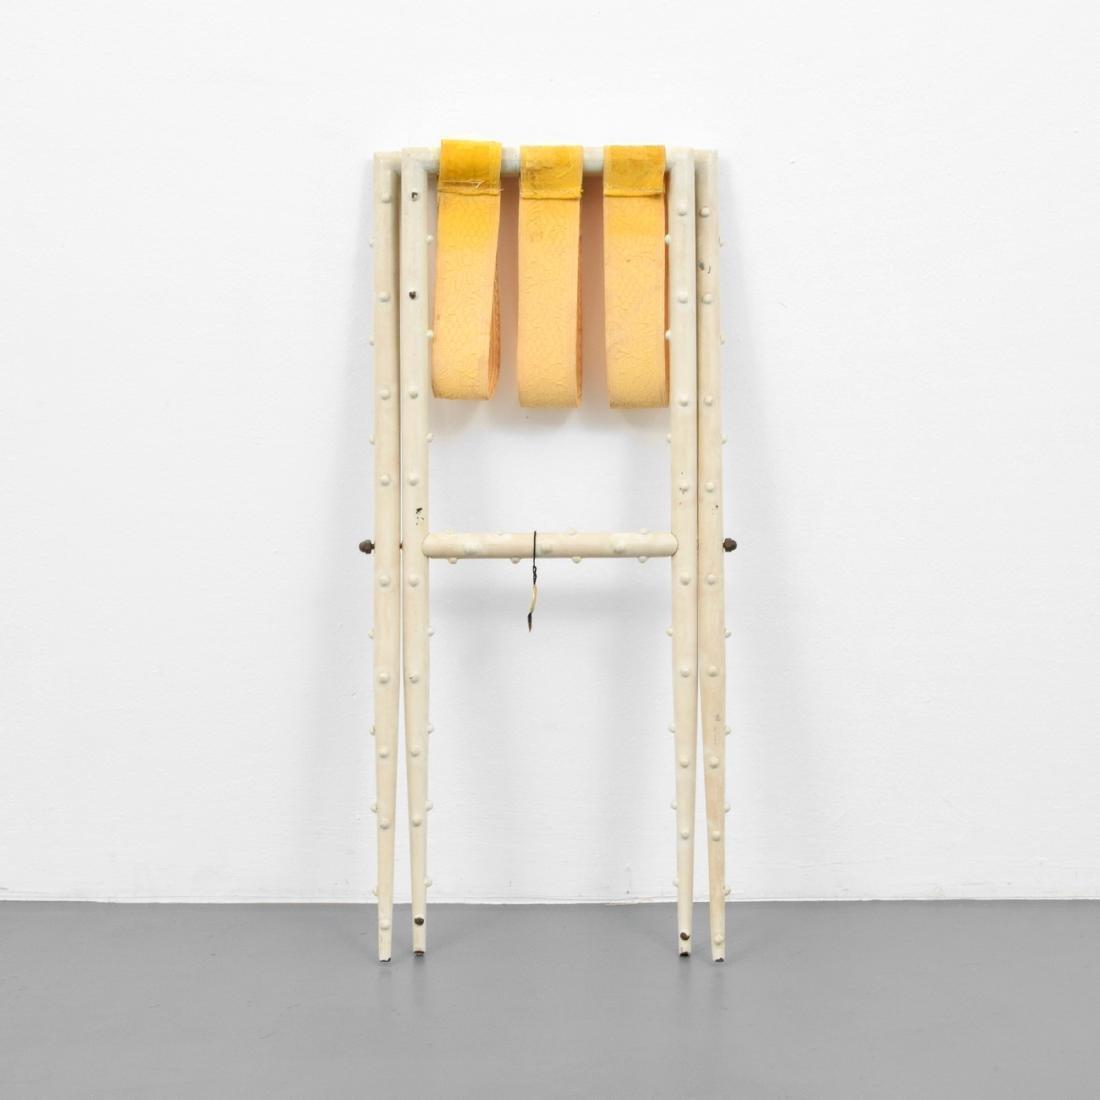 Piero Fornasetti Folding Luggage Stand - 5